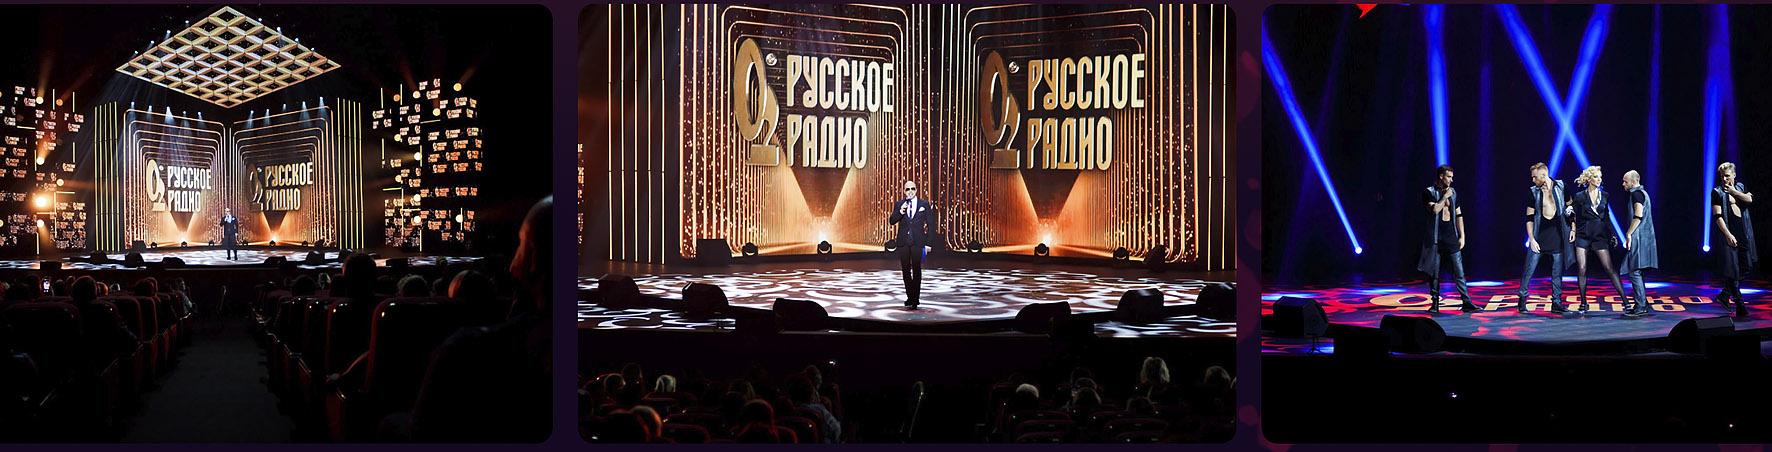 Реклама на Русское радио Дагестан Махачкала